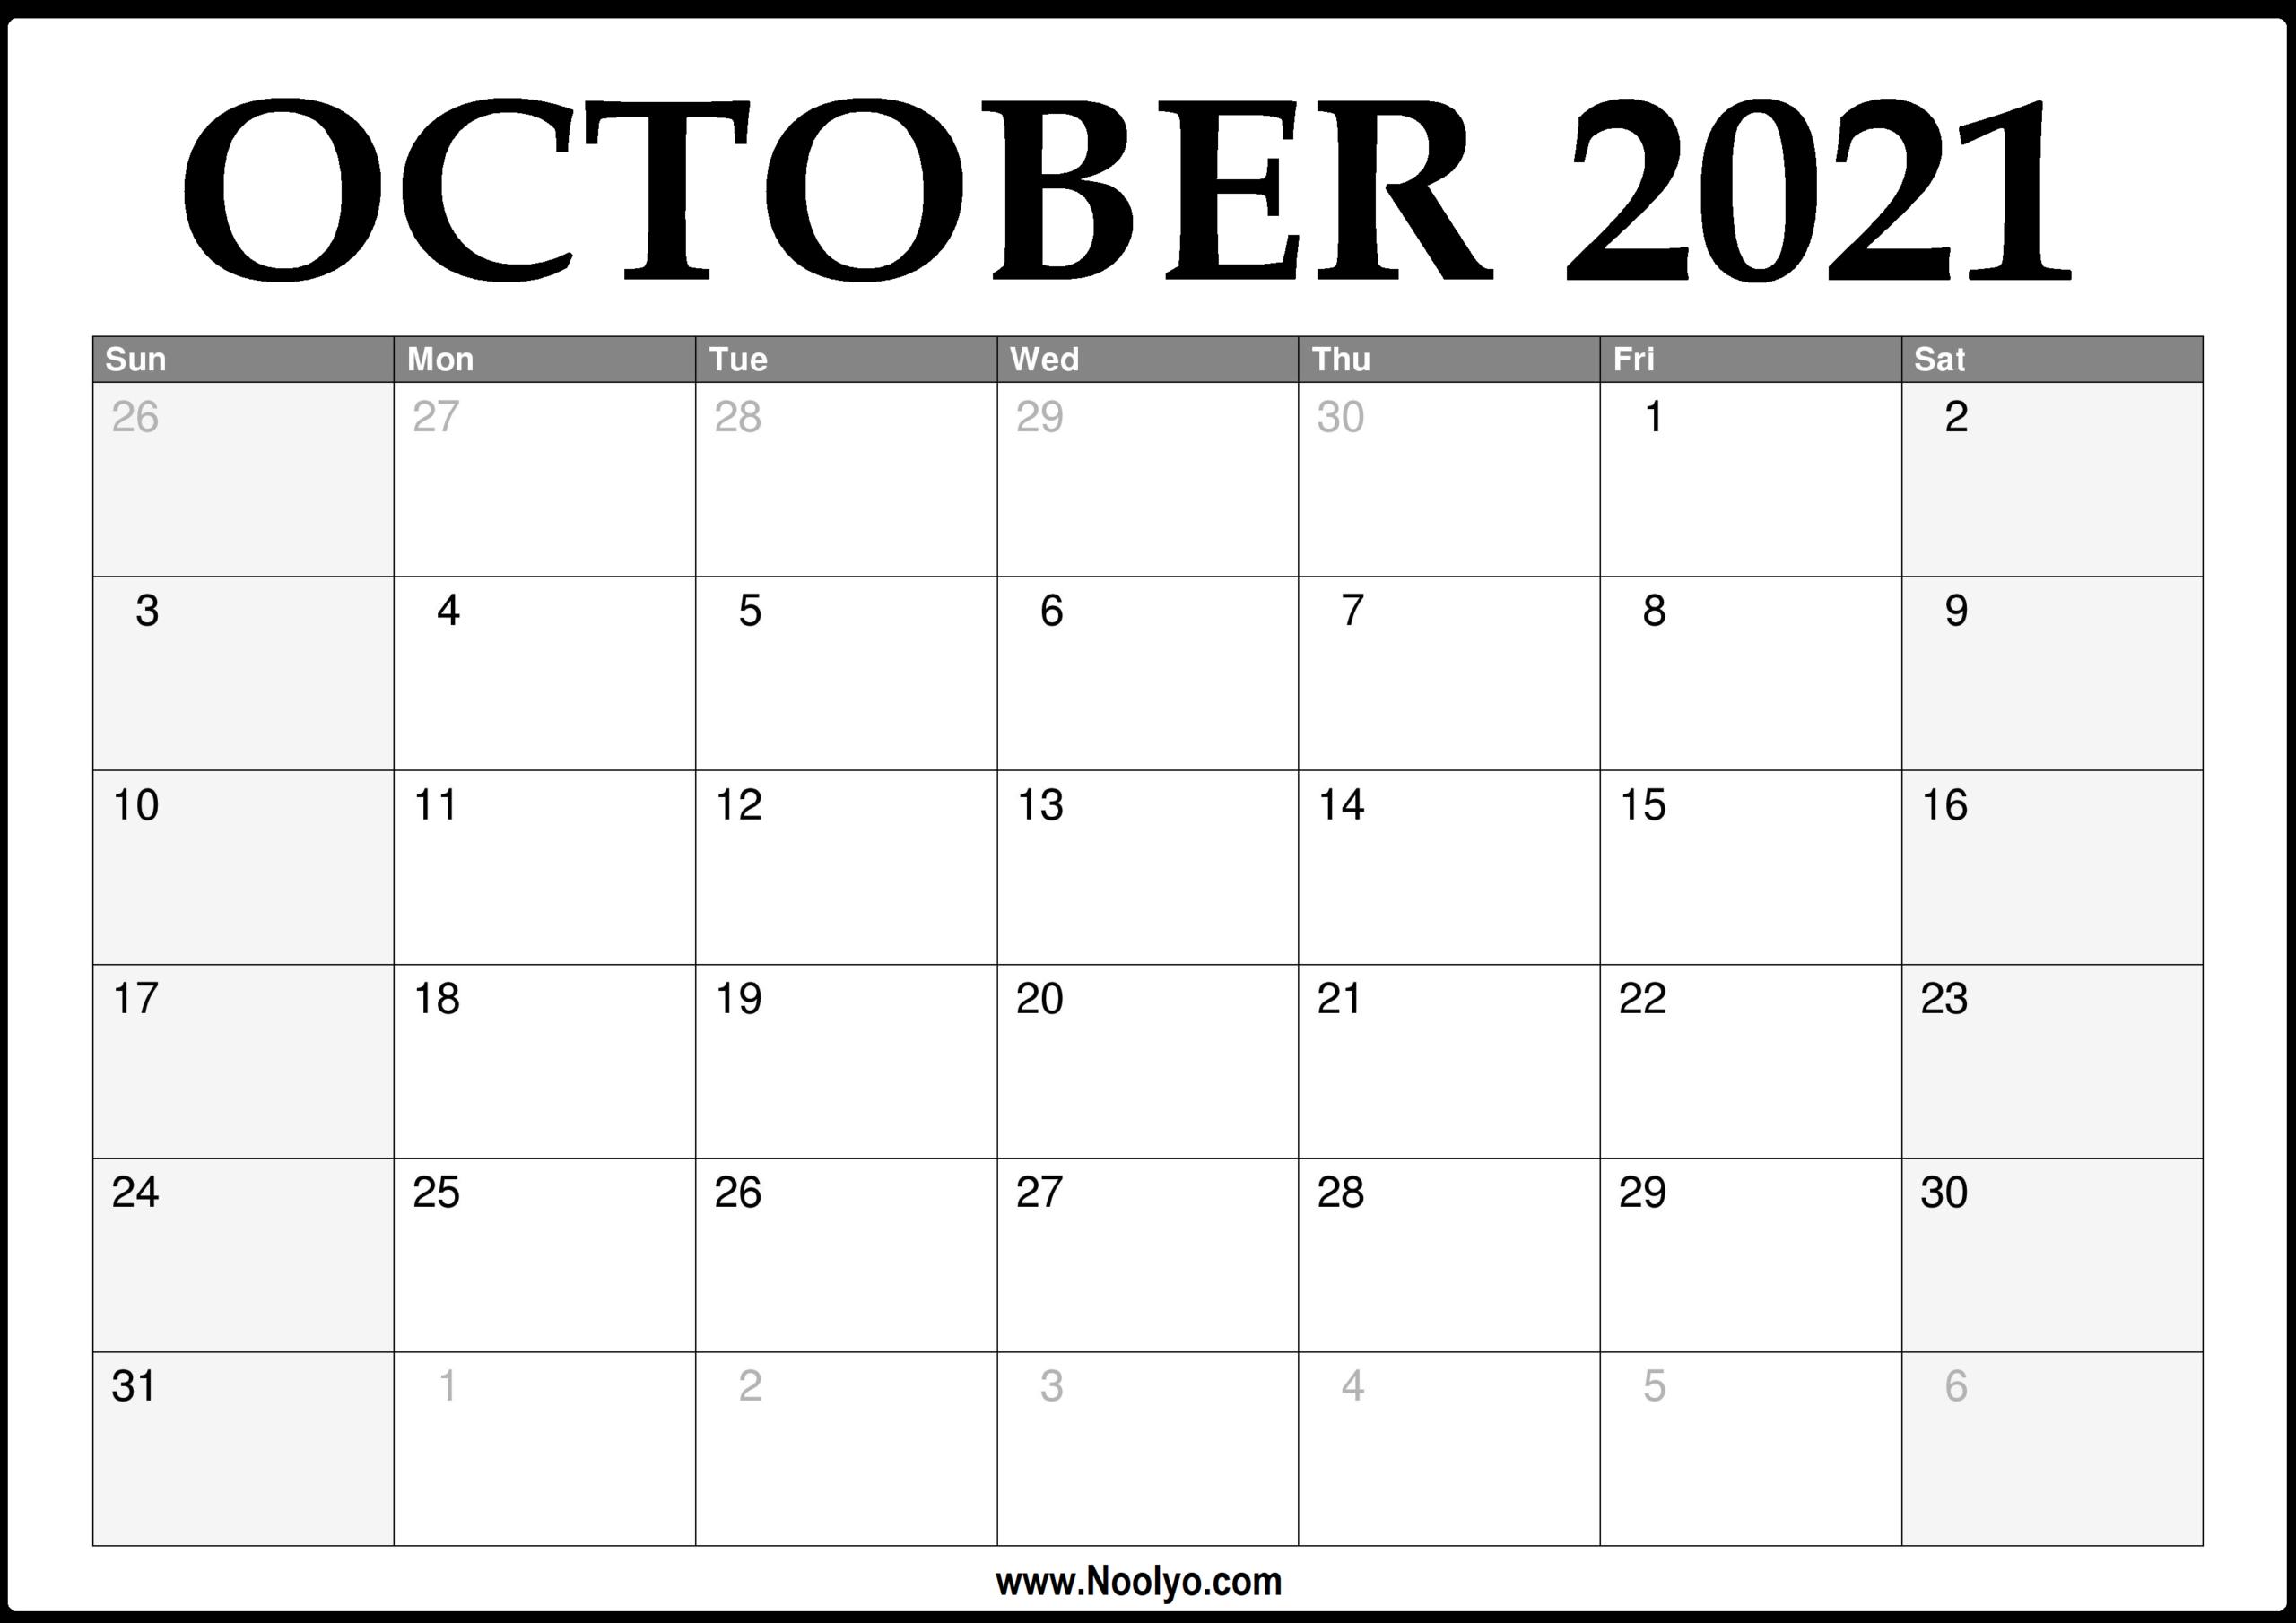 2021 October Calendar Printable – Download Free – Noolyo